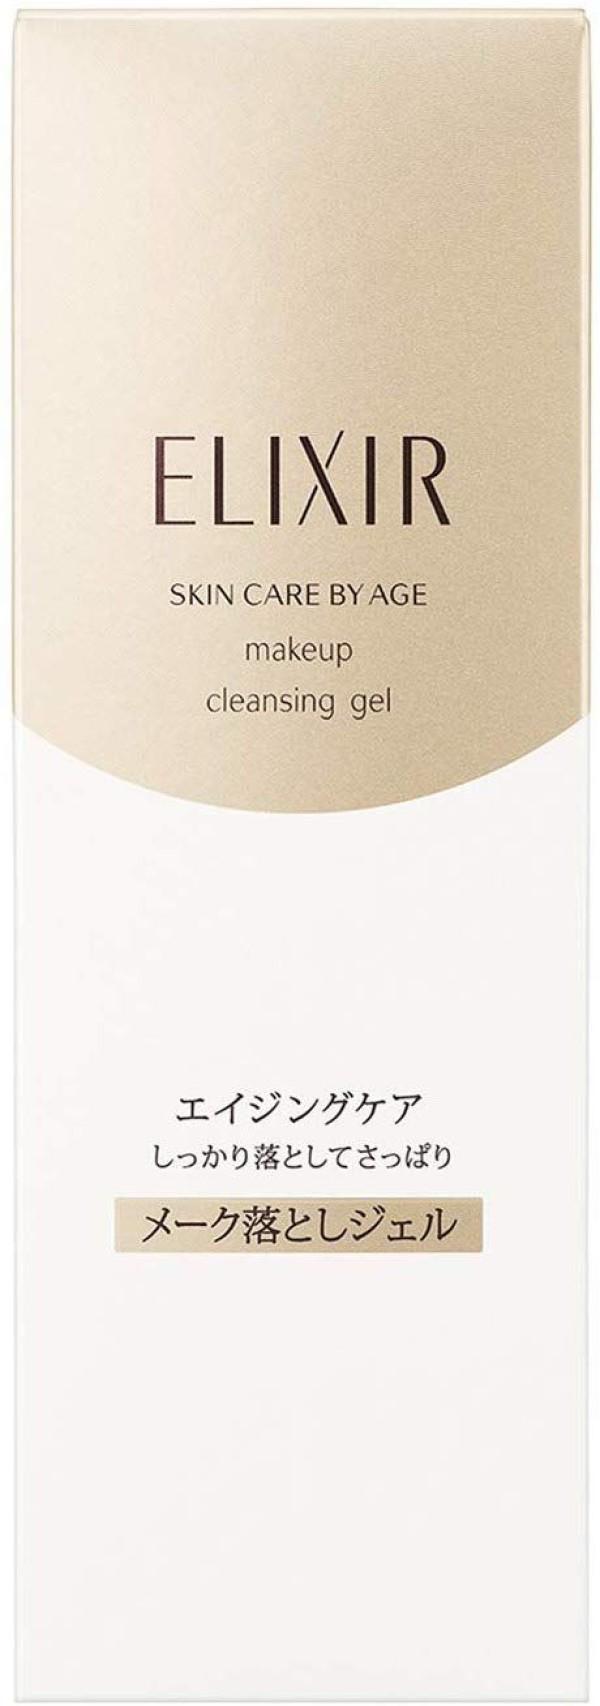 Гель для снятия макияжа Shiseido ELIXIR SUPERIEUR makeup cleansing gel